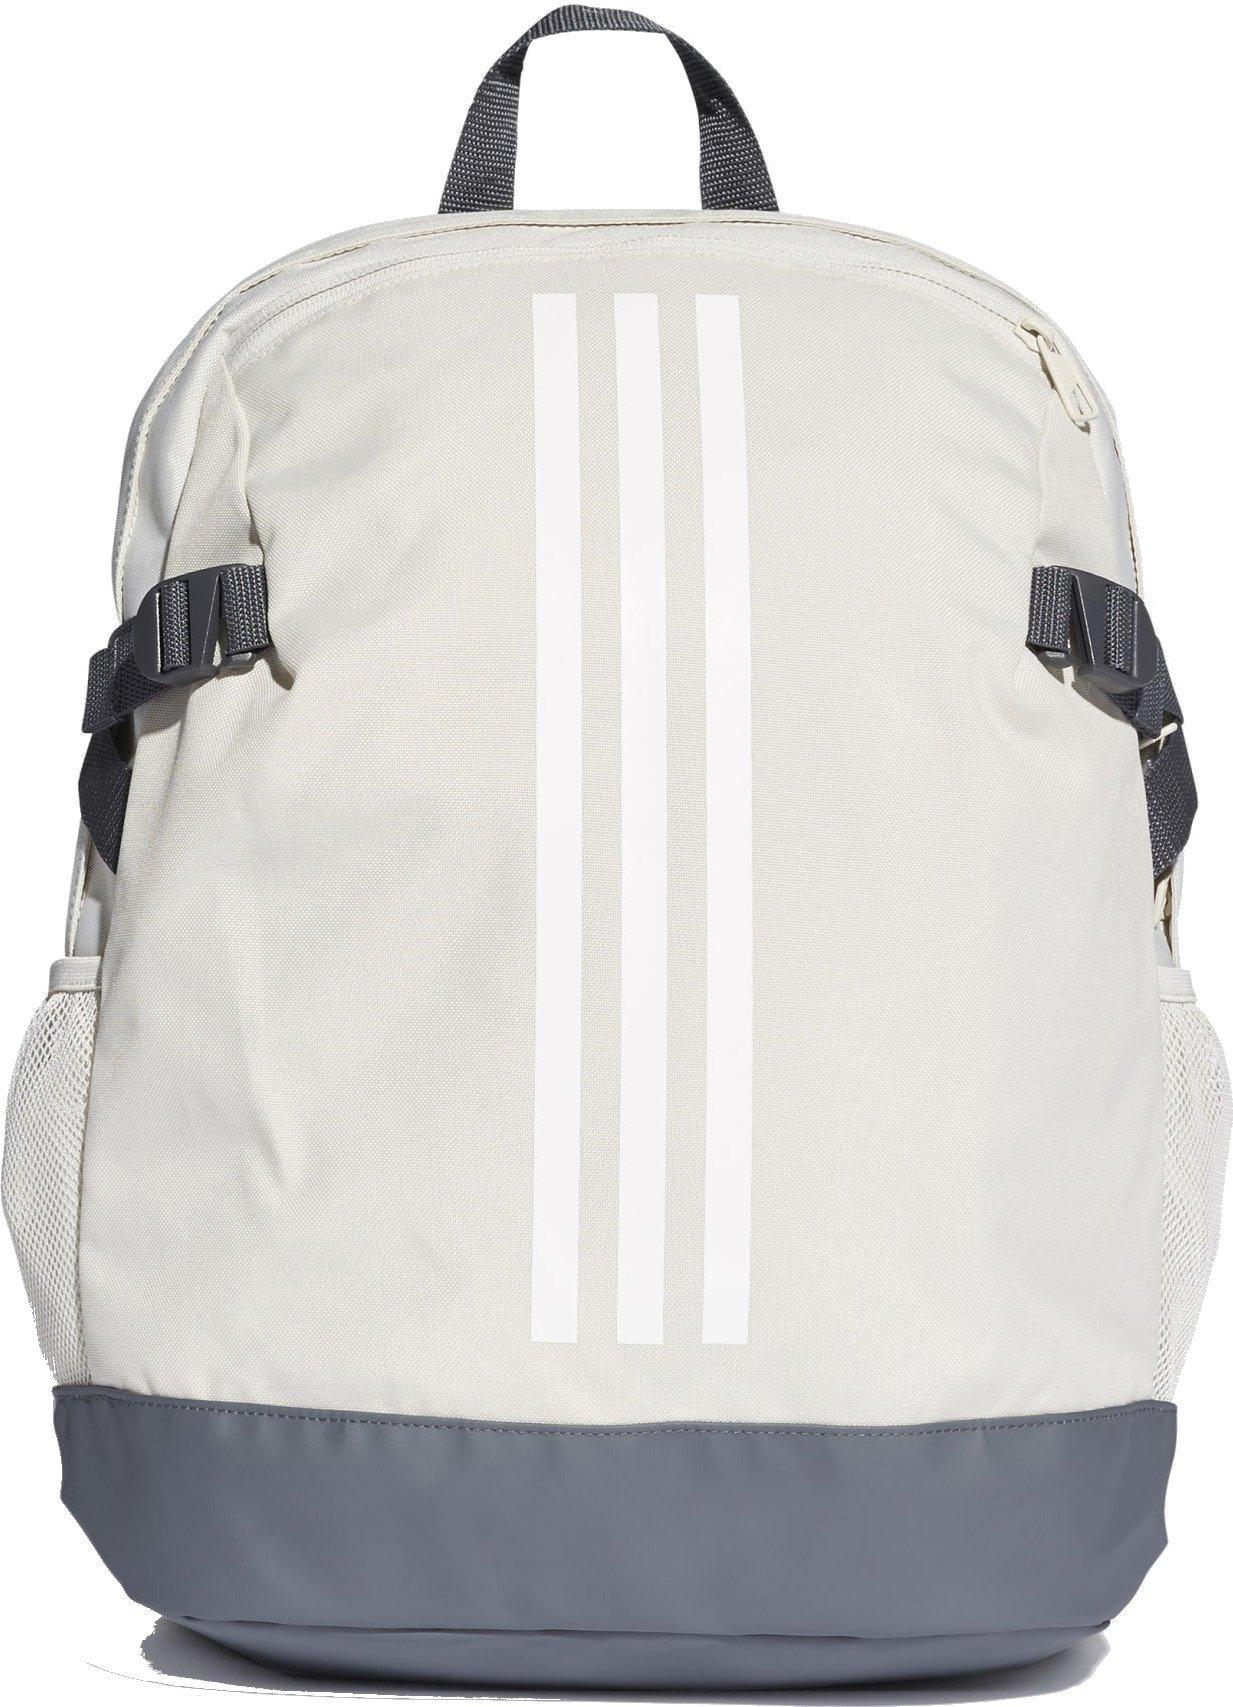 5c1fd3afc927 Batoh adidas BP POWER IV M du2009. Nové Batoh adidas BP POWER ...